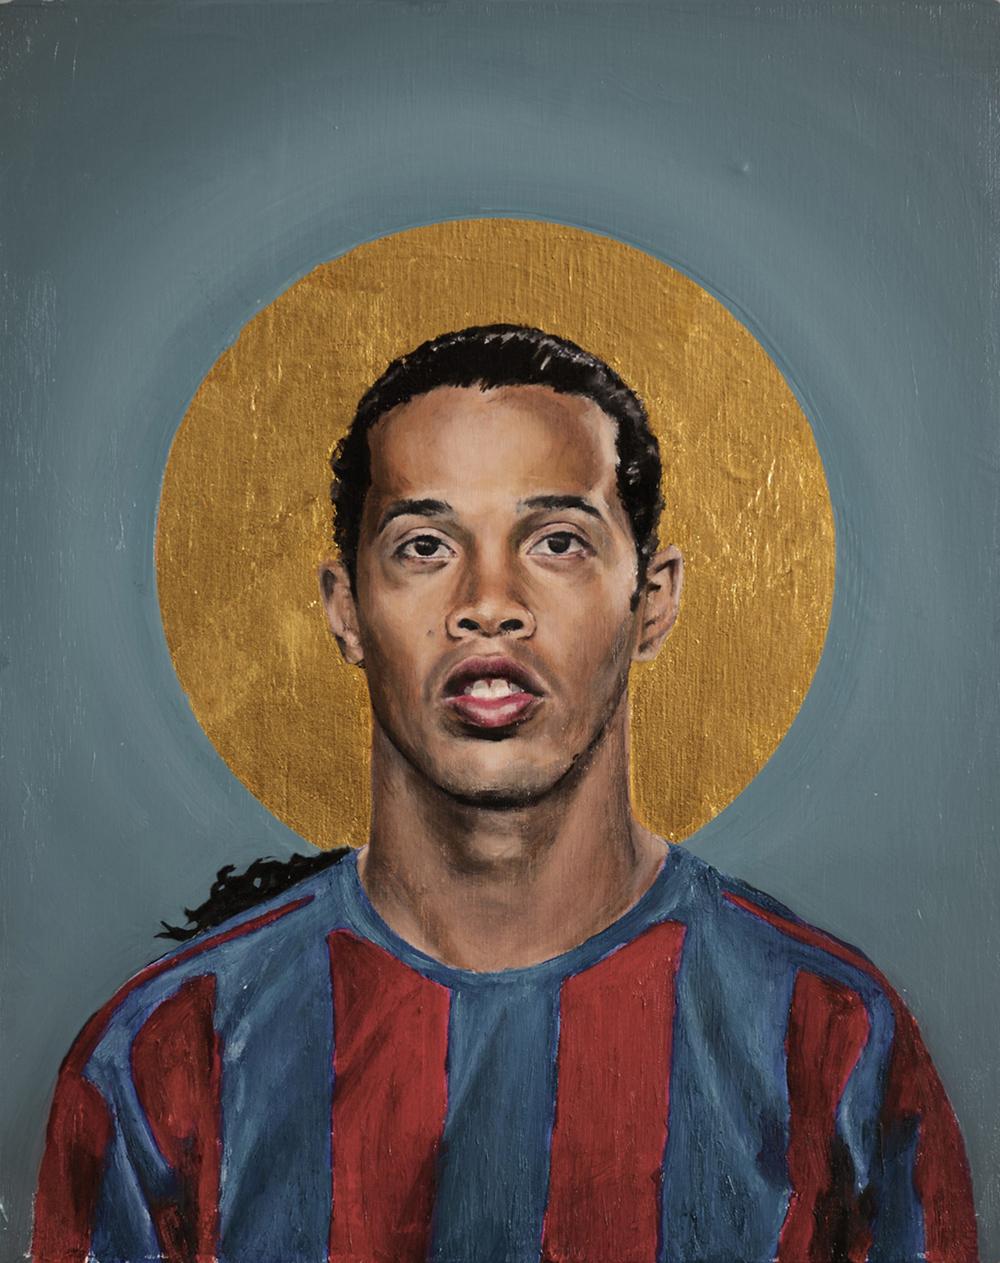 Ronaldinho_DEF2small.jpg